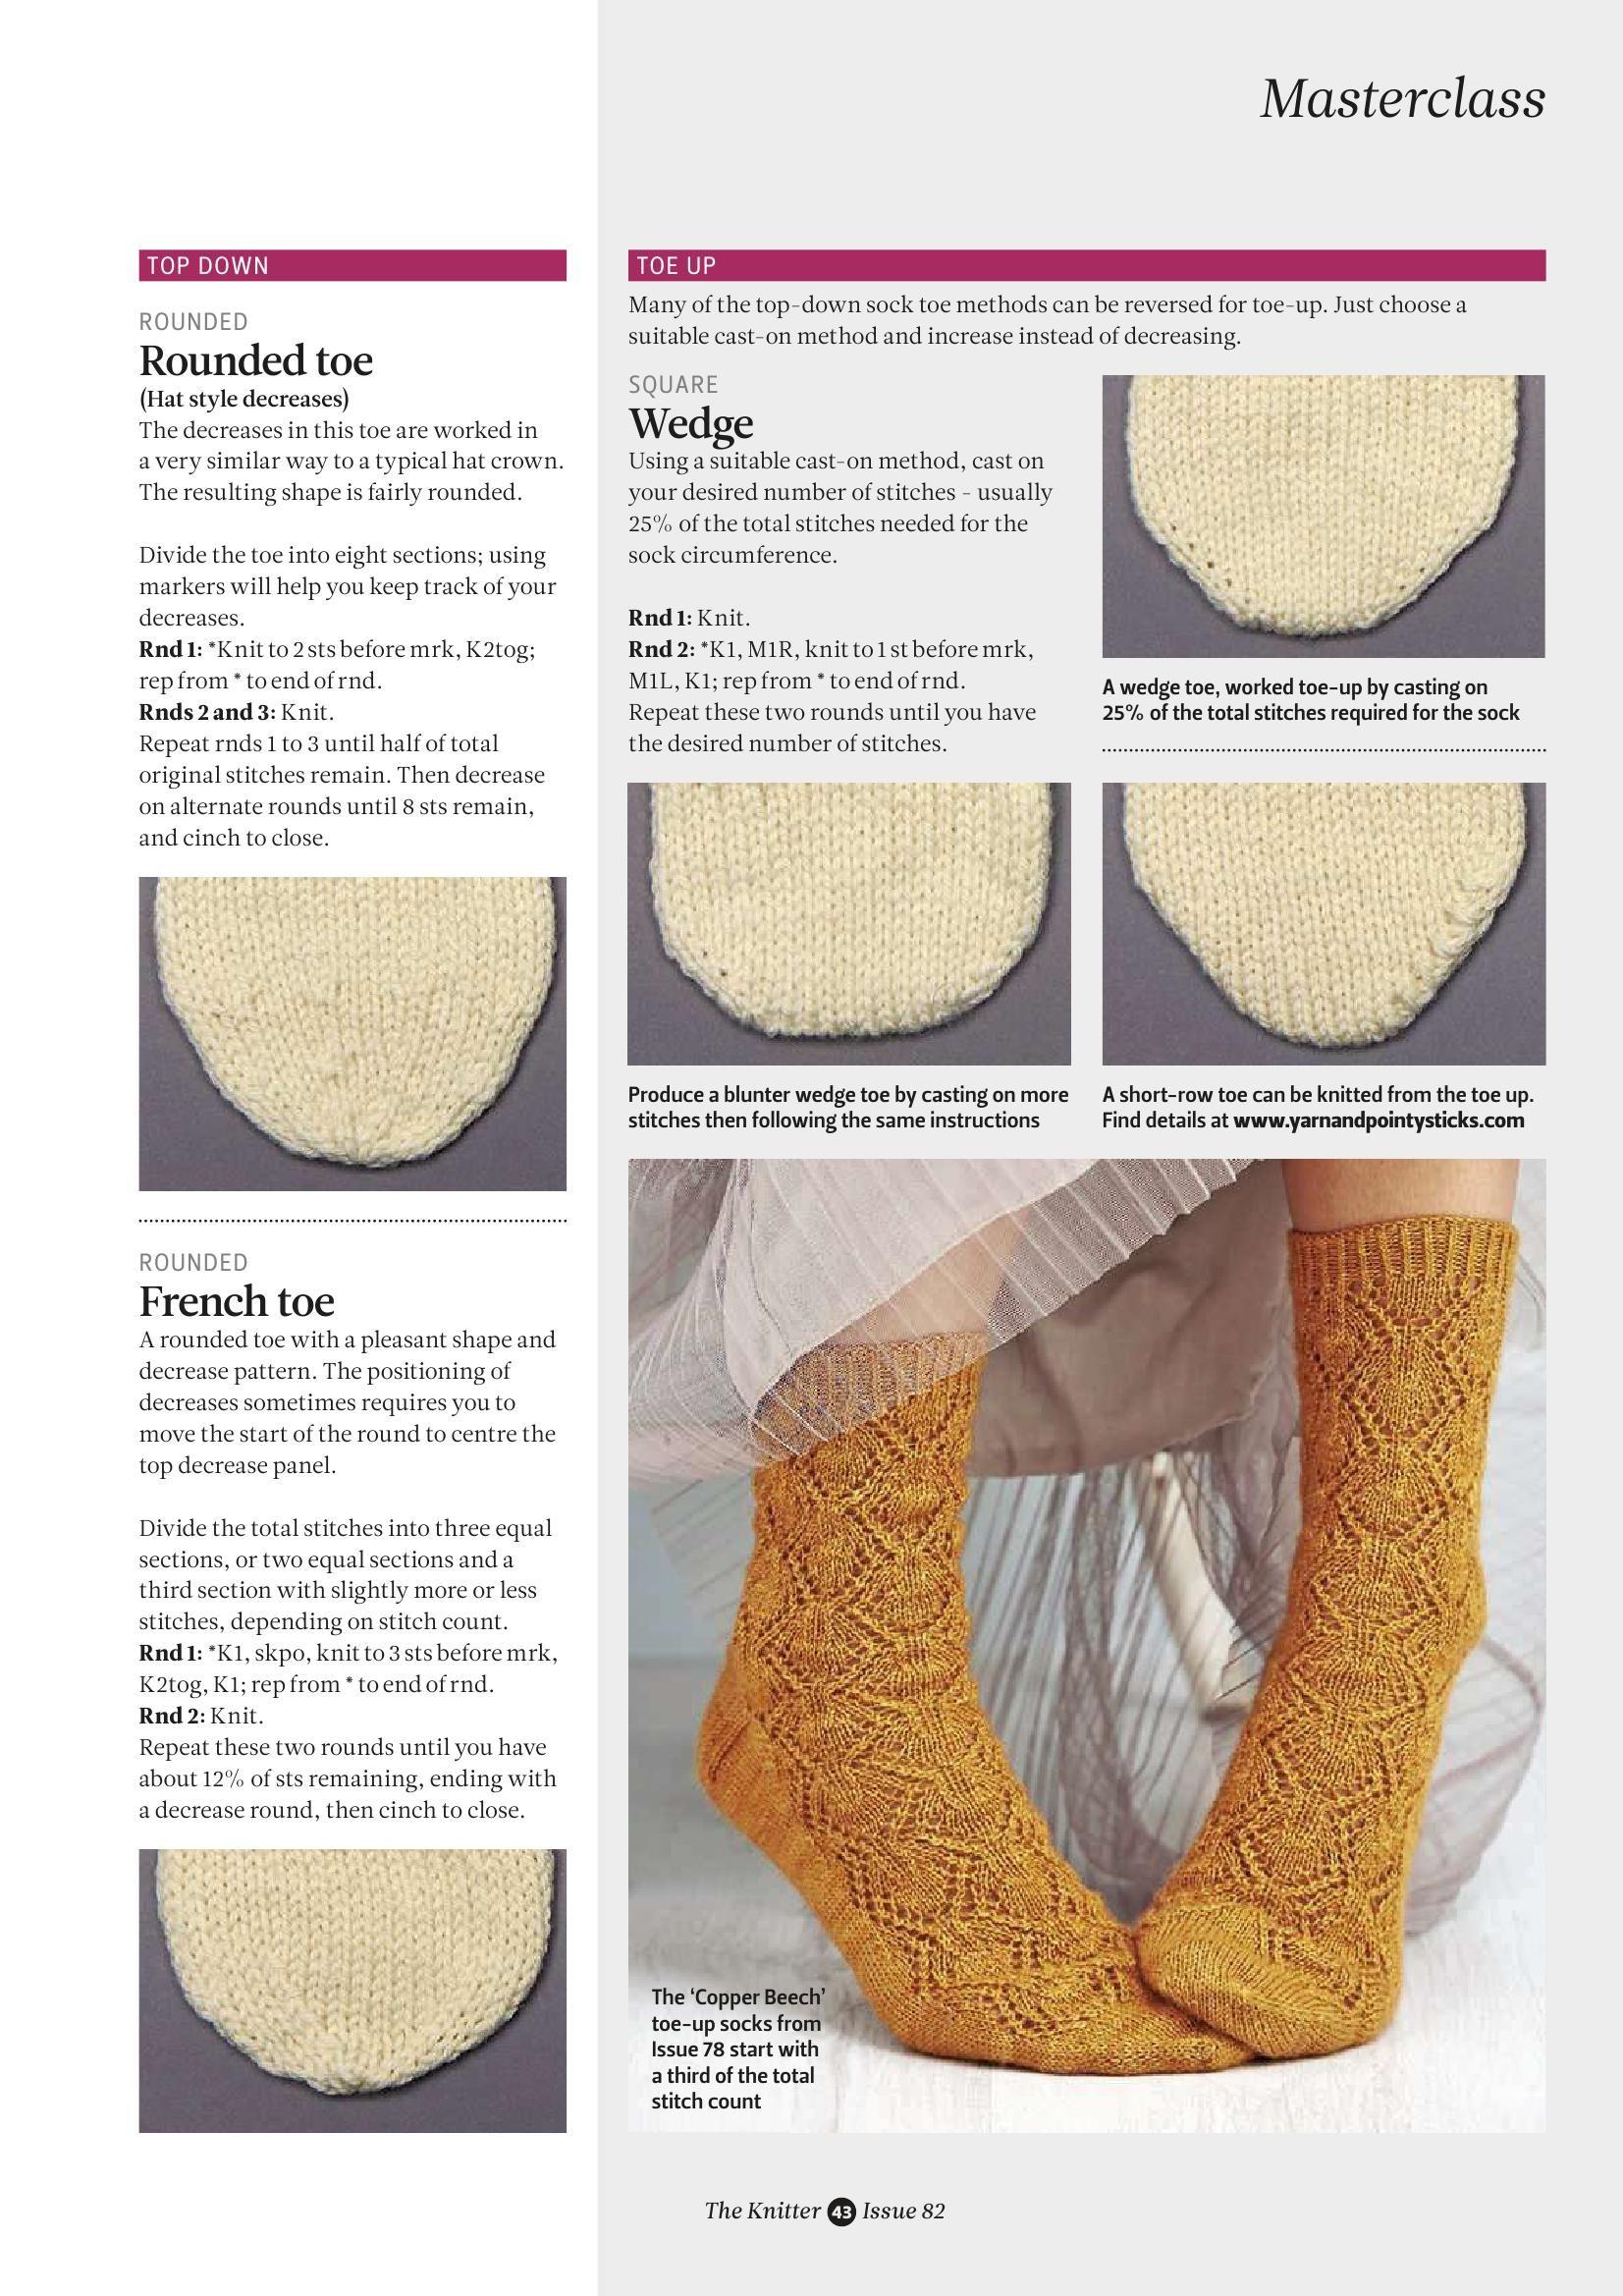 Masterclass: toe styles for socks part 4 | Knit charts | Pinterest ...